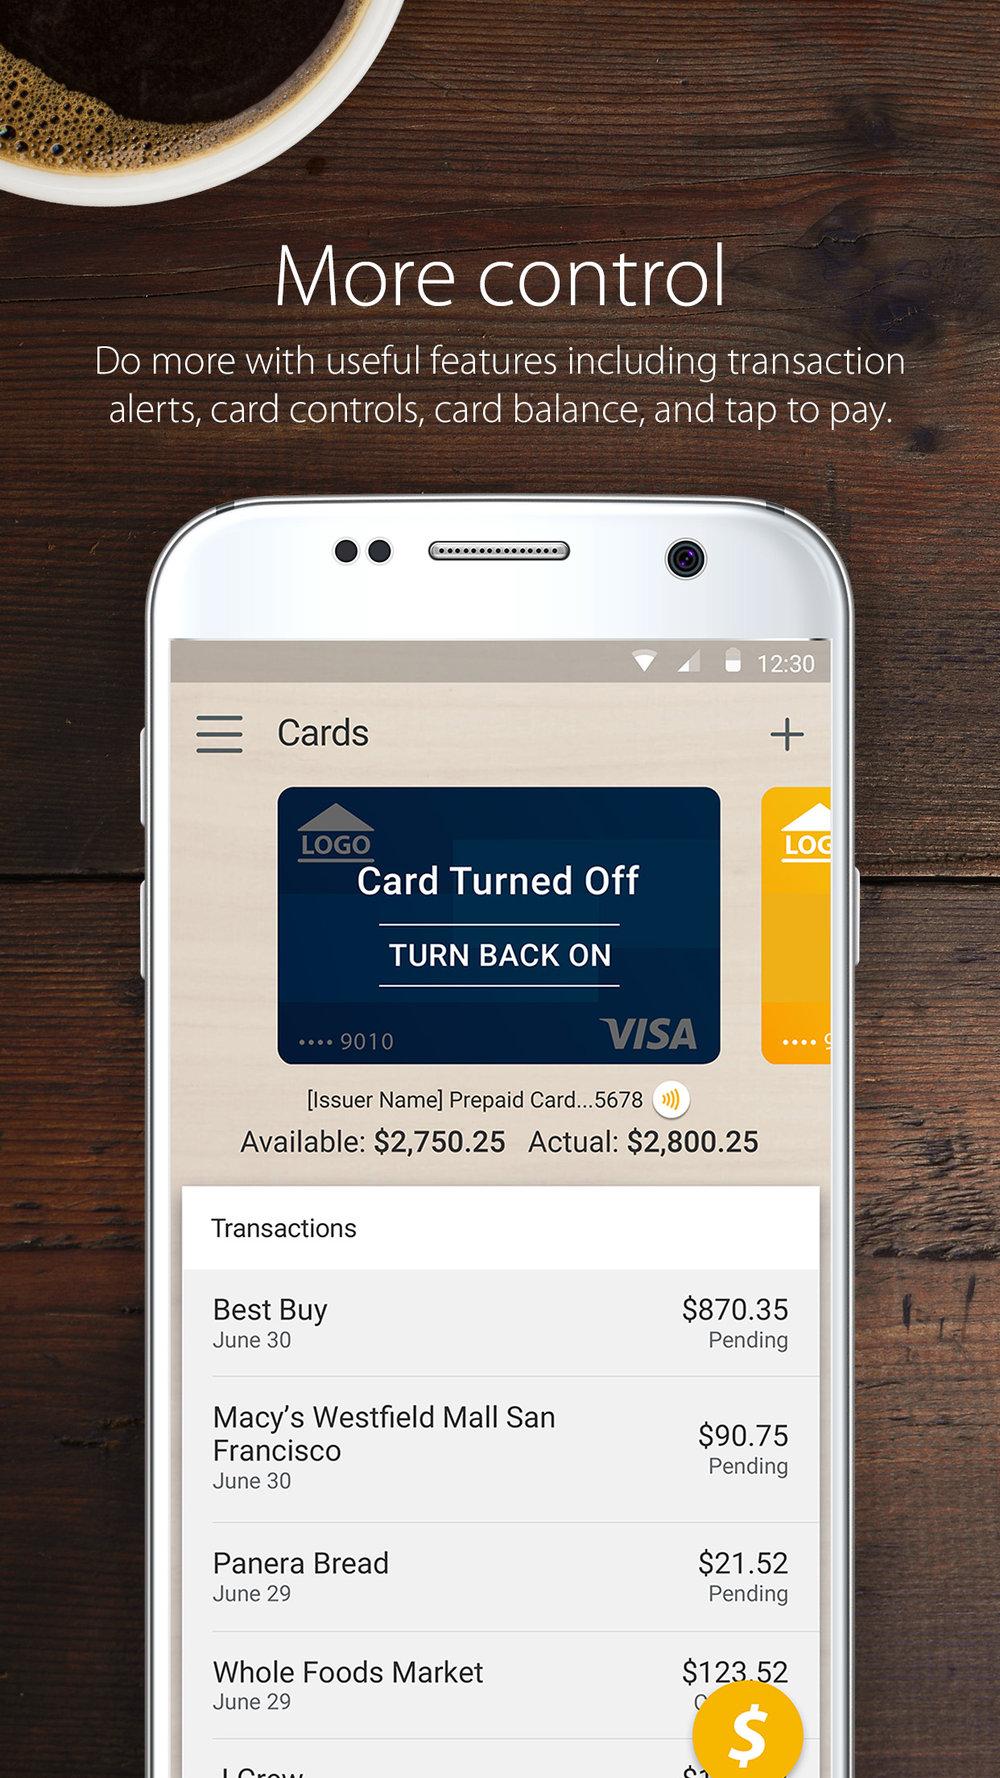 Visa-AppStore-_0001_1 Android.jpg